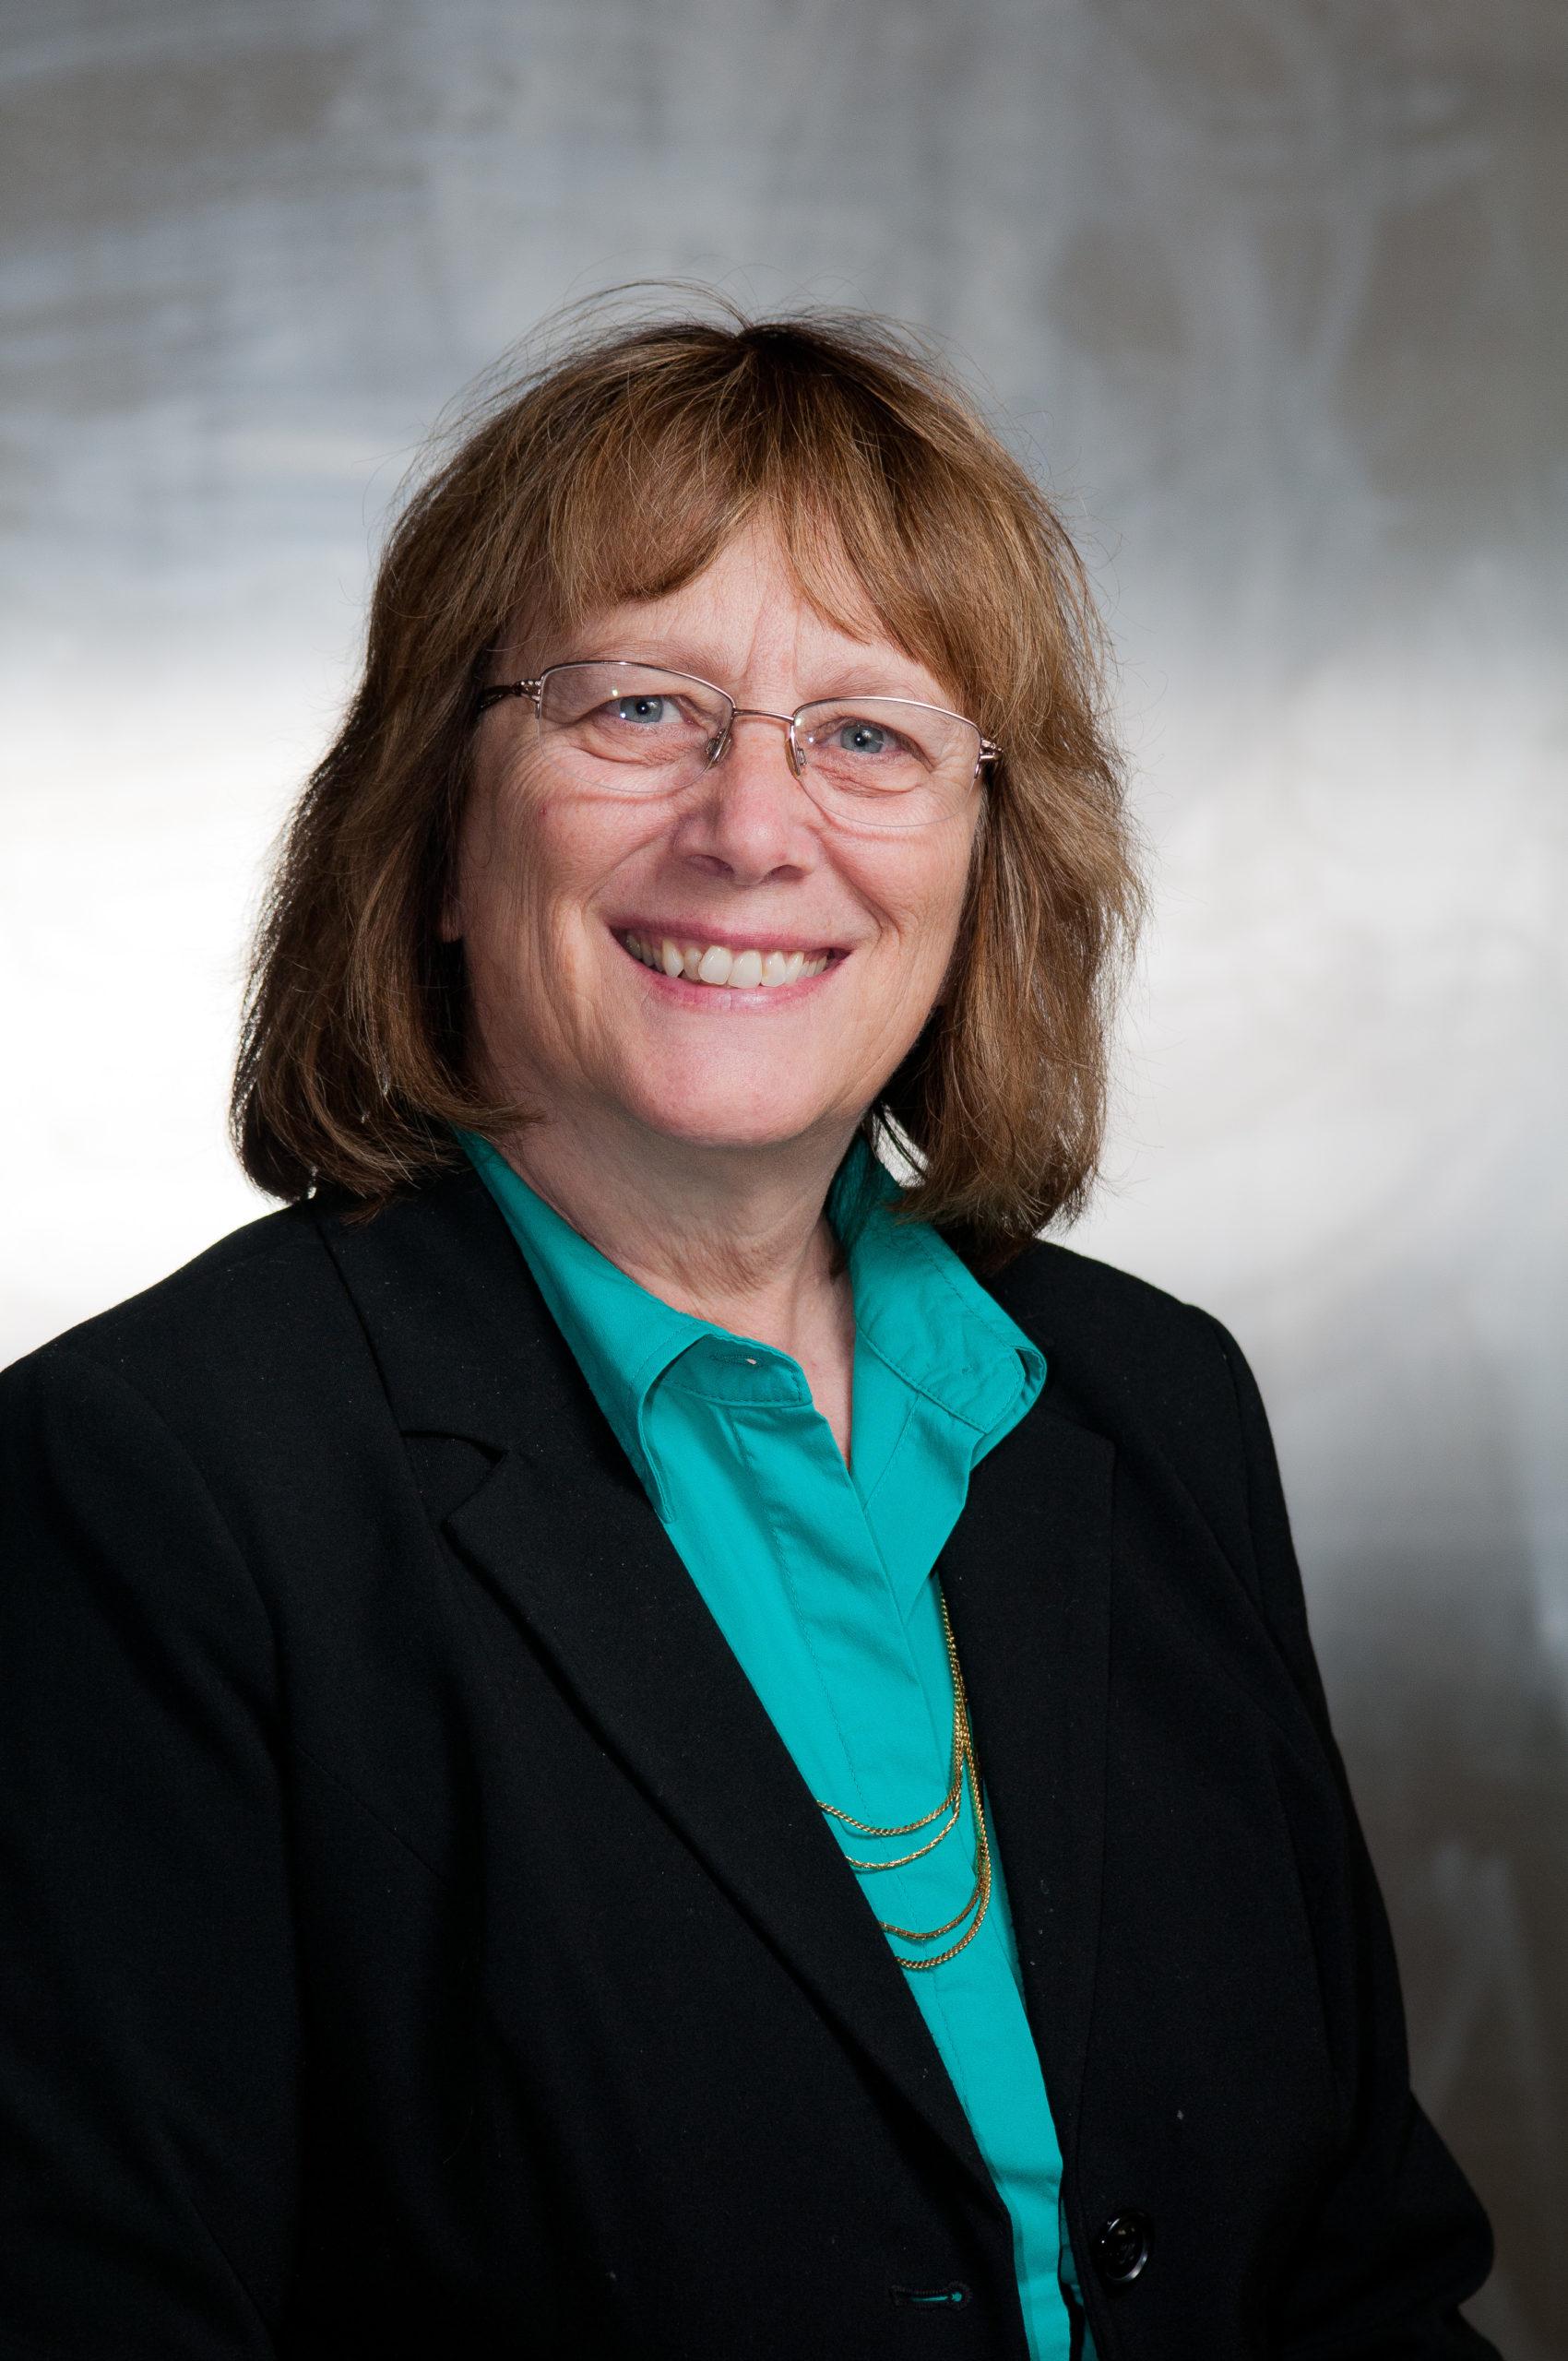 Nancy Kauffman